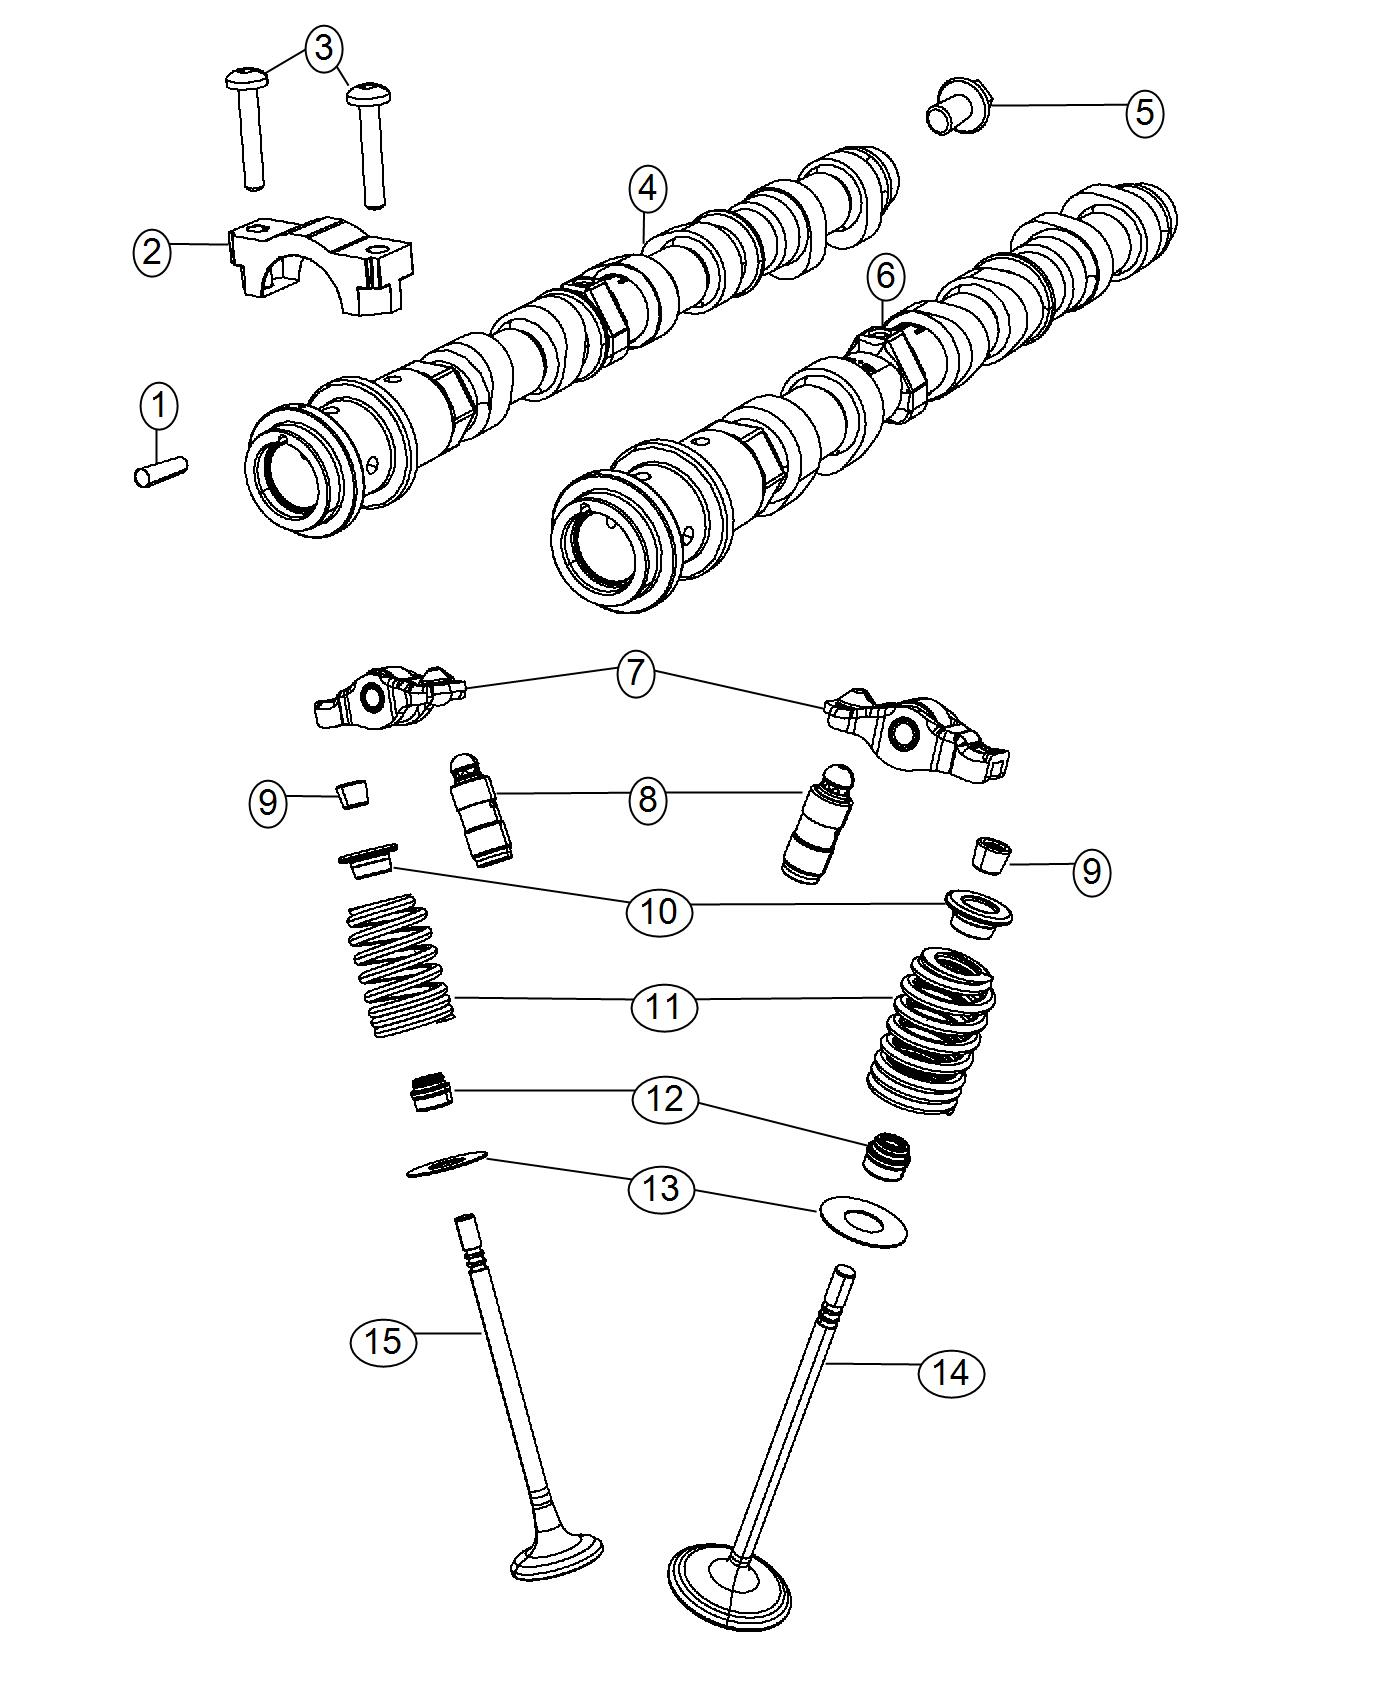 Jeep Cherokee Rocker Arm Valve